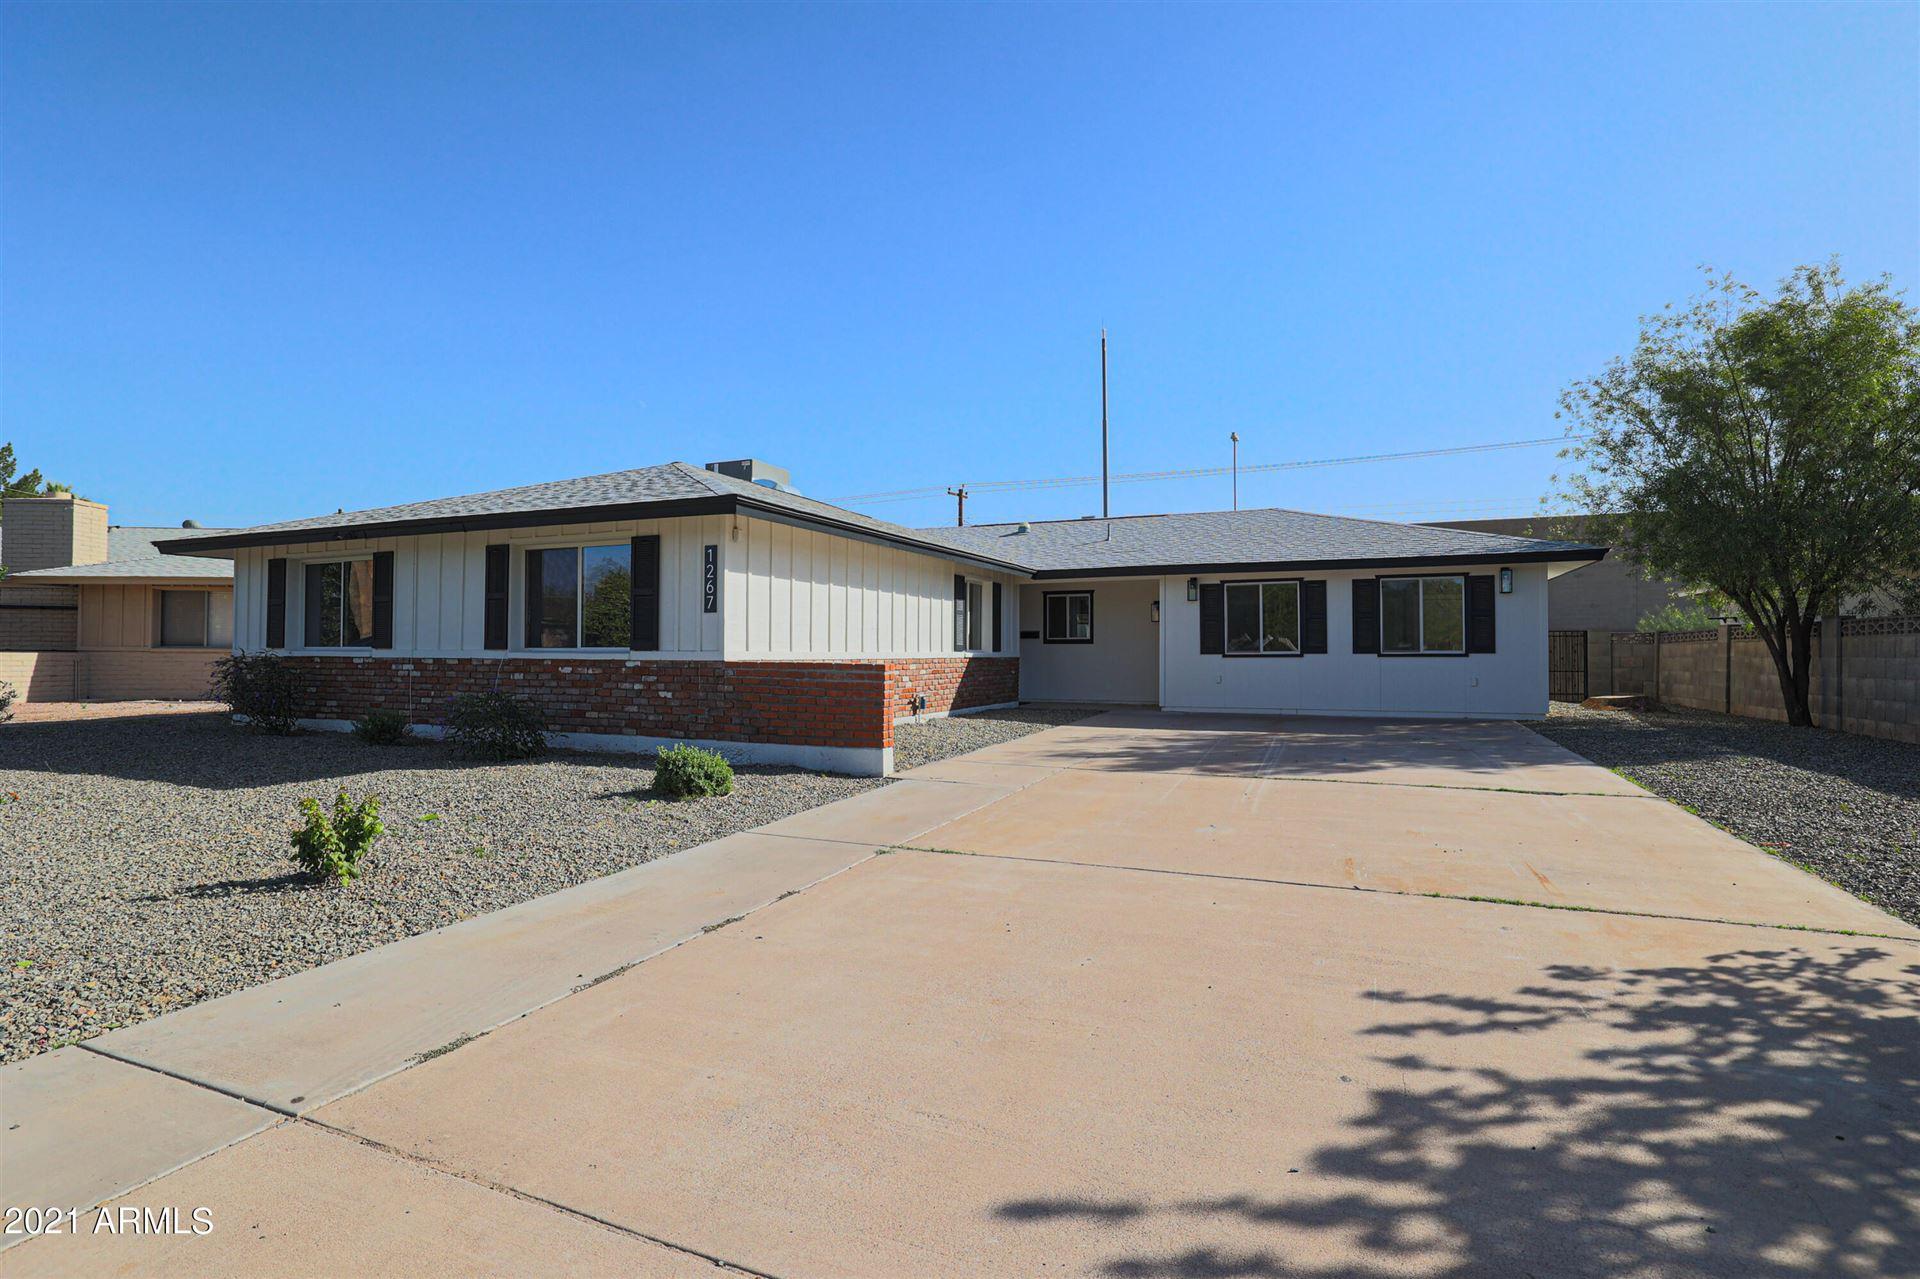 Photo of 1267 E RIVIERA Drive, Tempe, AZ 85282 (MLS # 6306721)